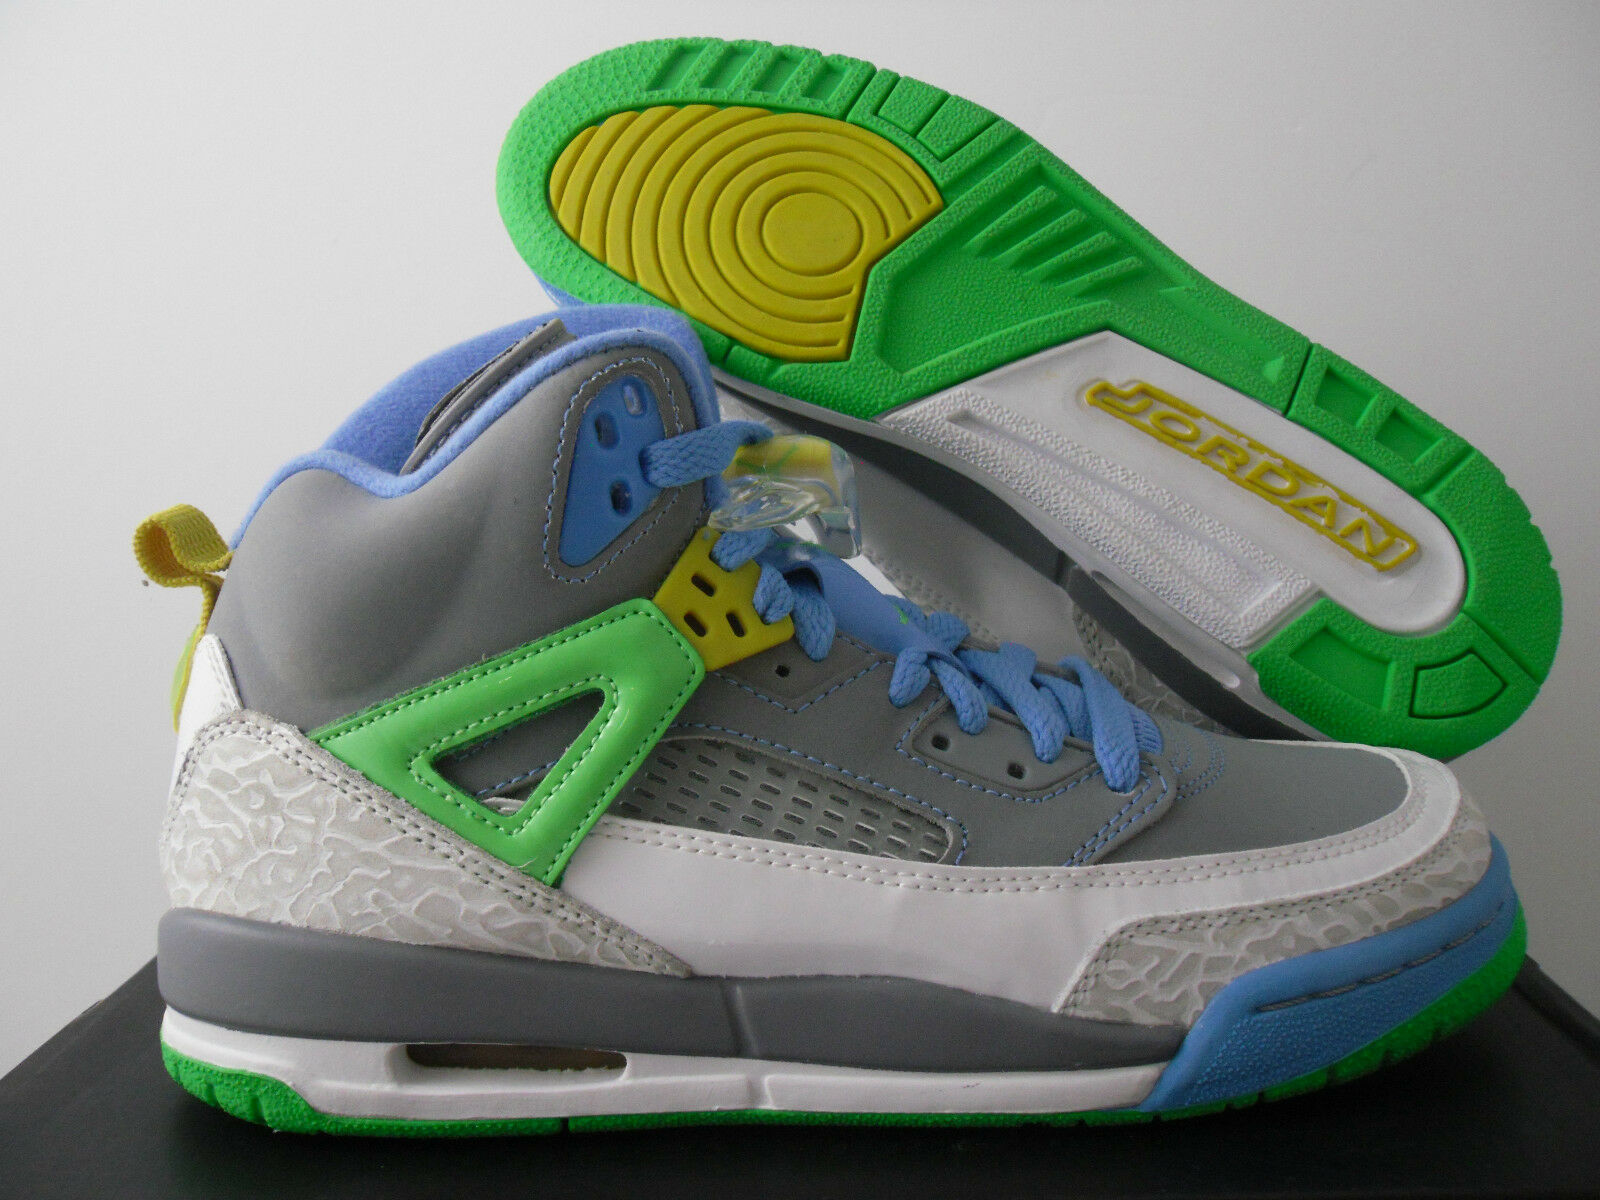 Nike air jordan spizike (gs) pasqua grey-green sz 6y-Donna sz - 317321-056]